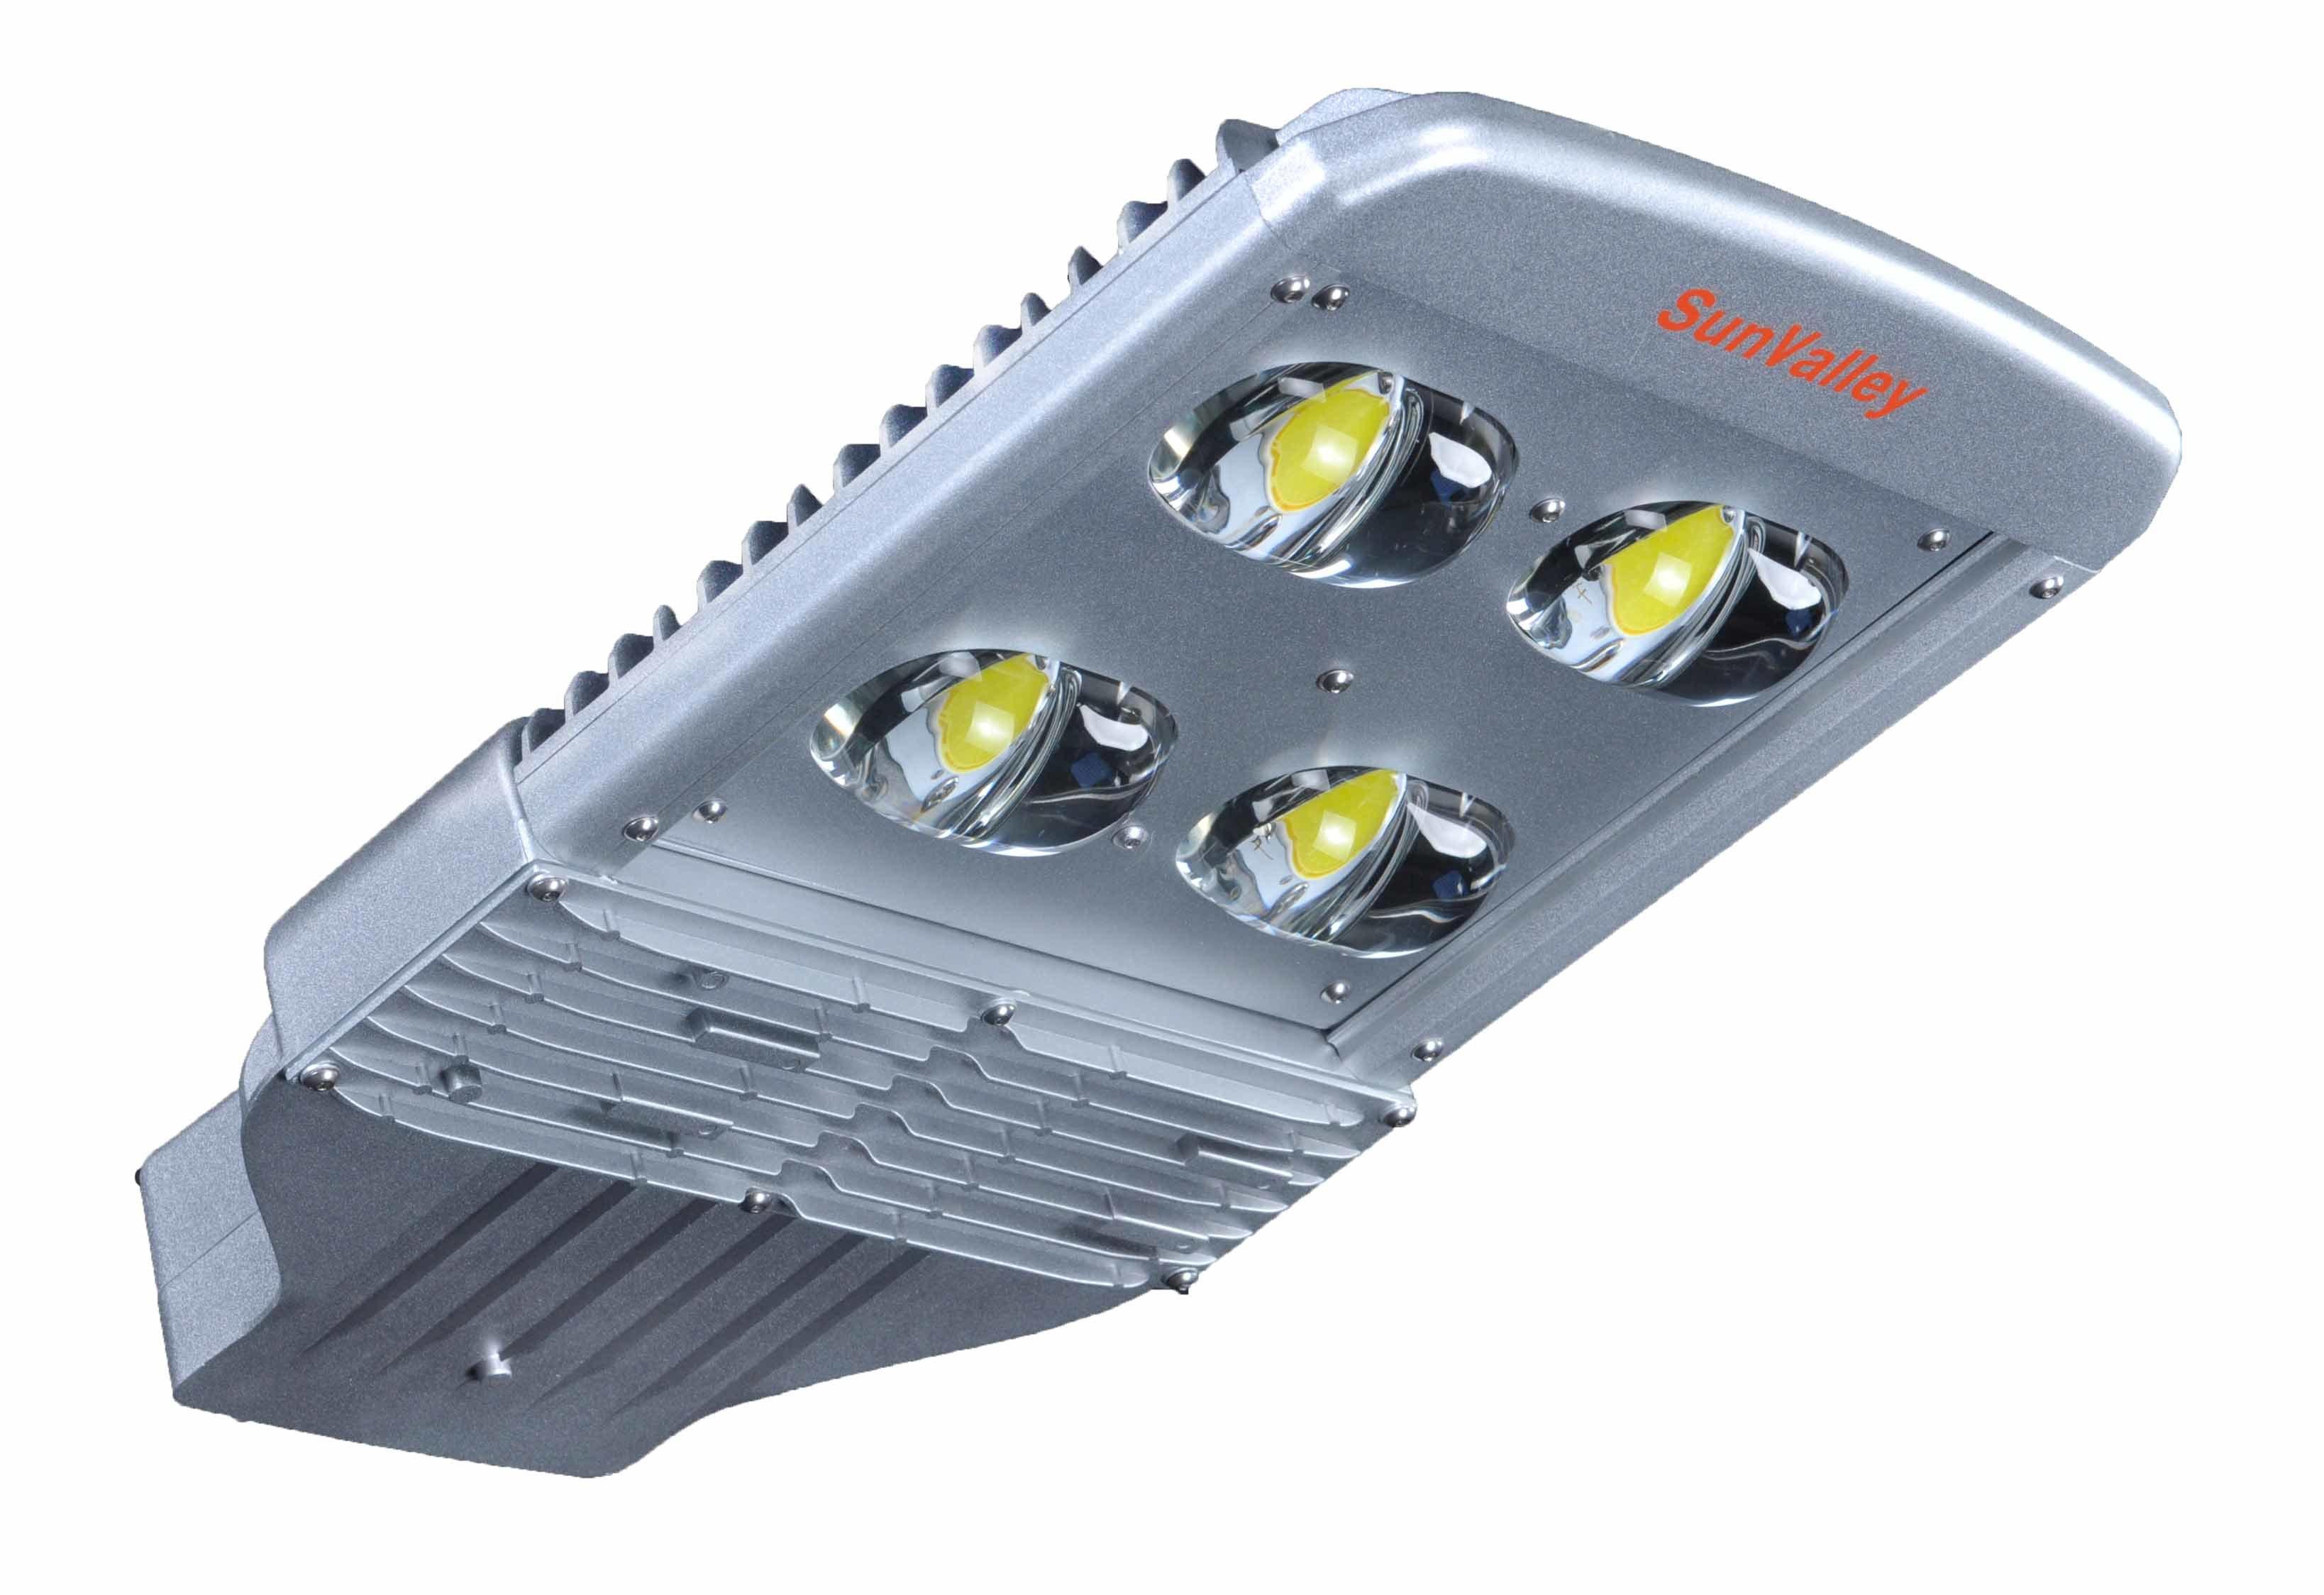 LED Street Light with UL, 120W Type III (Polarized light)